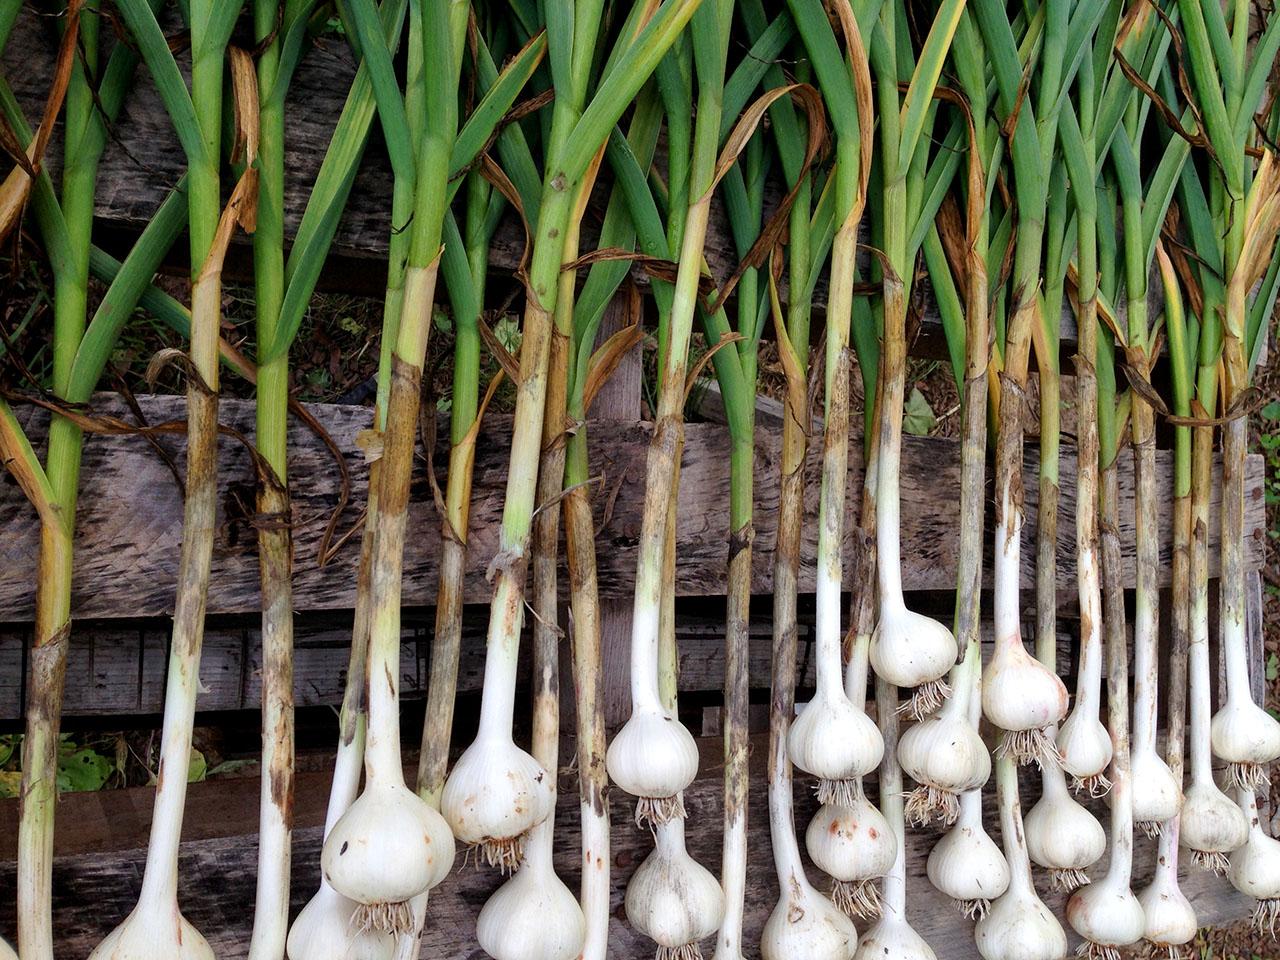 Onions - Farm Fresh